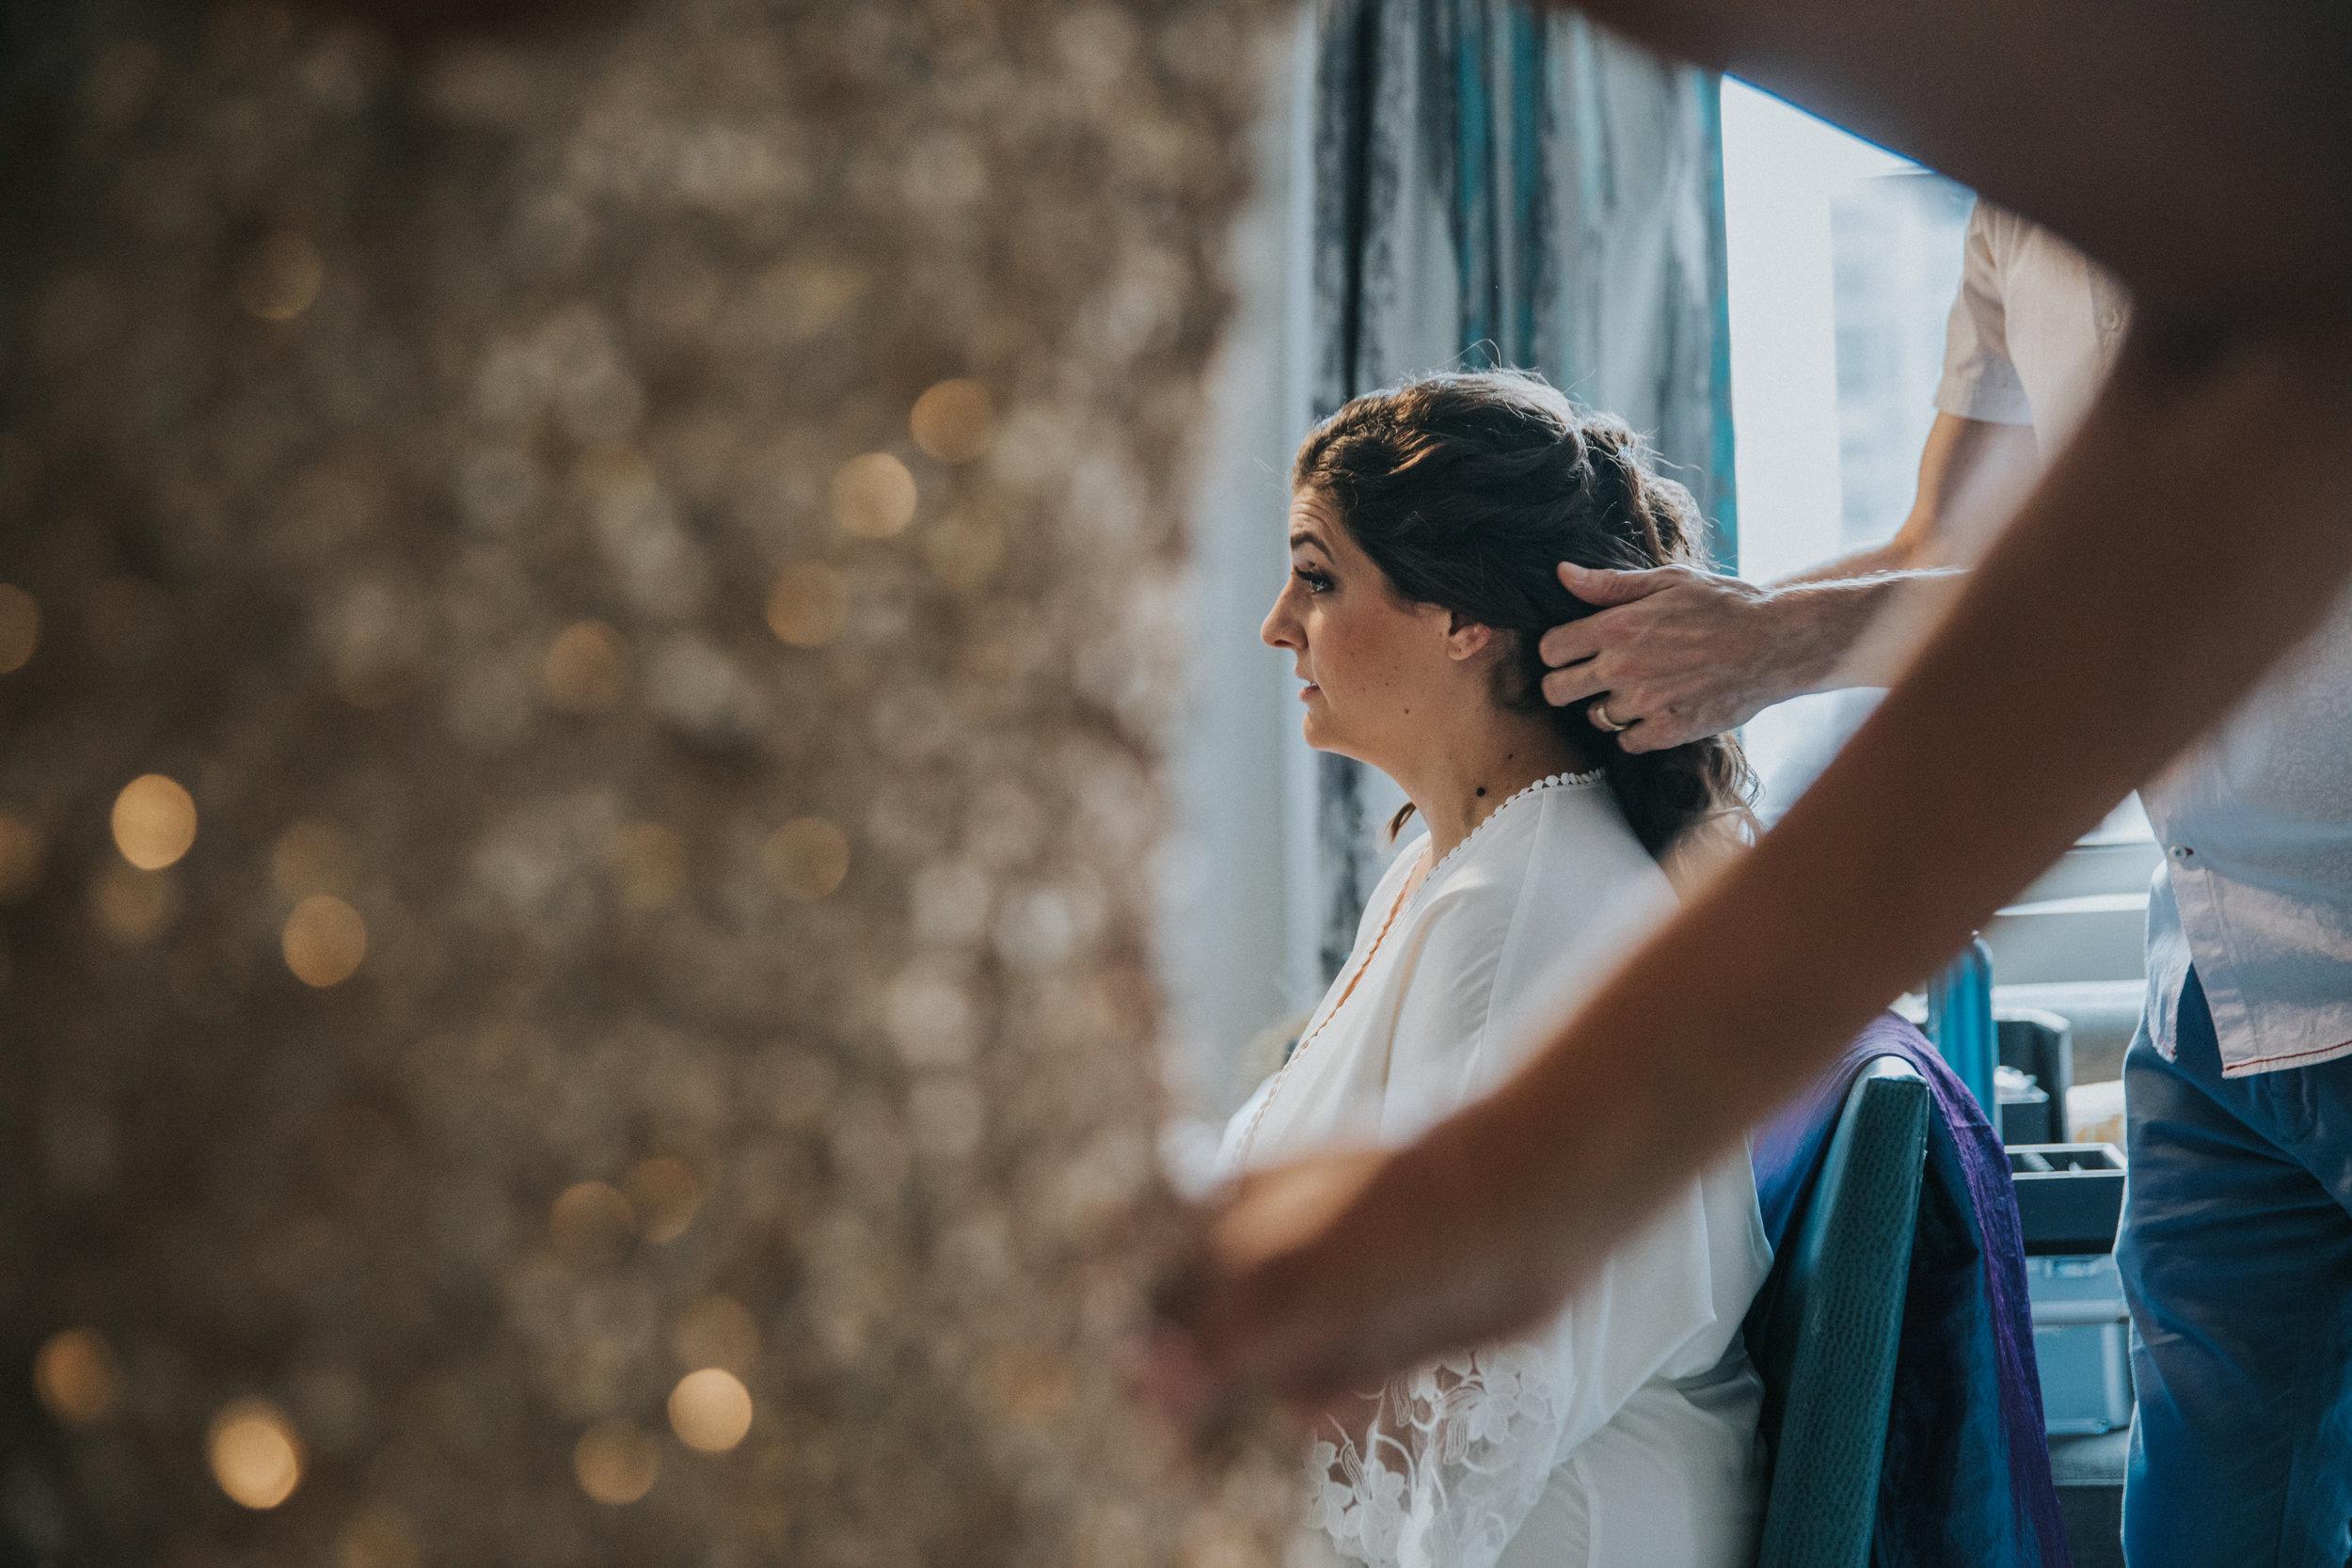 JennaLynnPhotography-NJWeddingPhotographer-Philadelphia-Wedding-ArtsBallroom-GettingReady-17.jpg